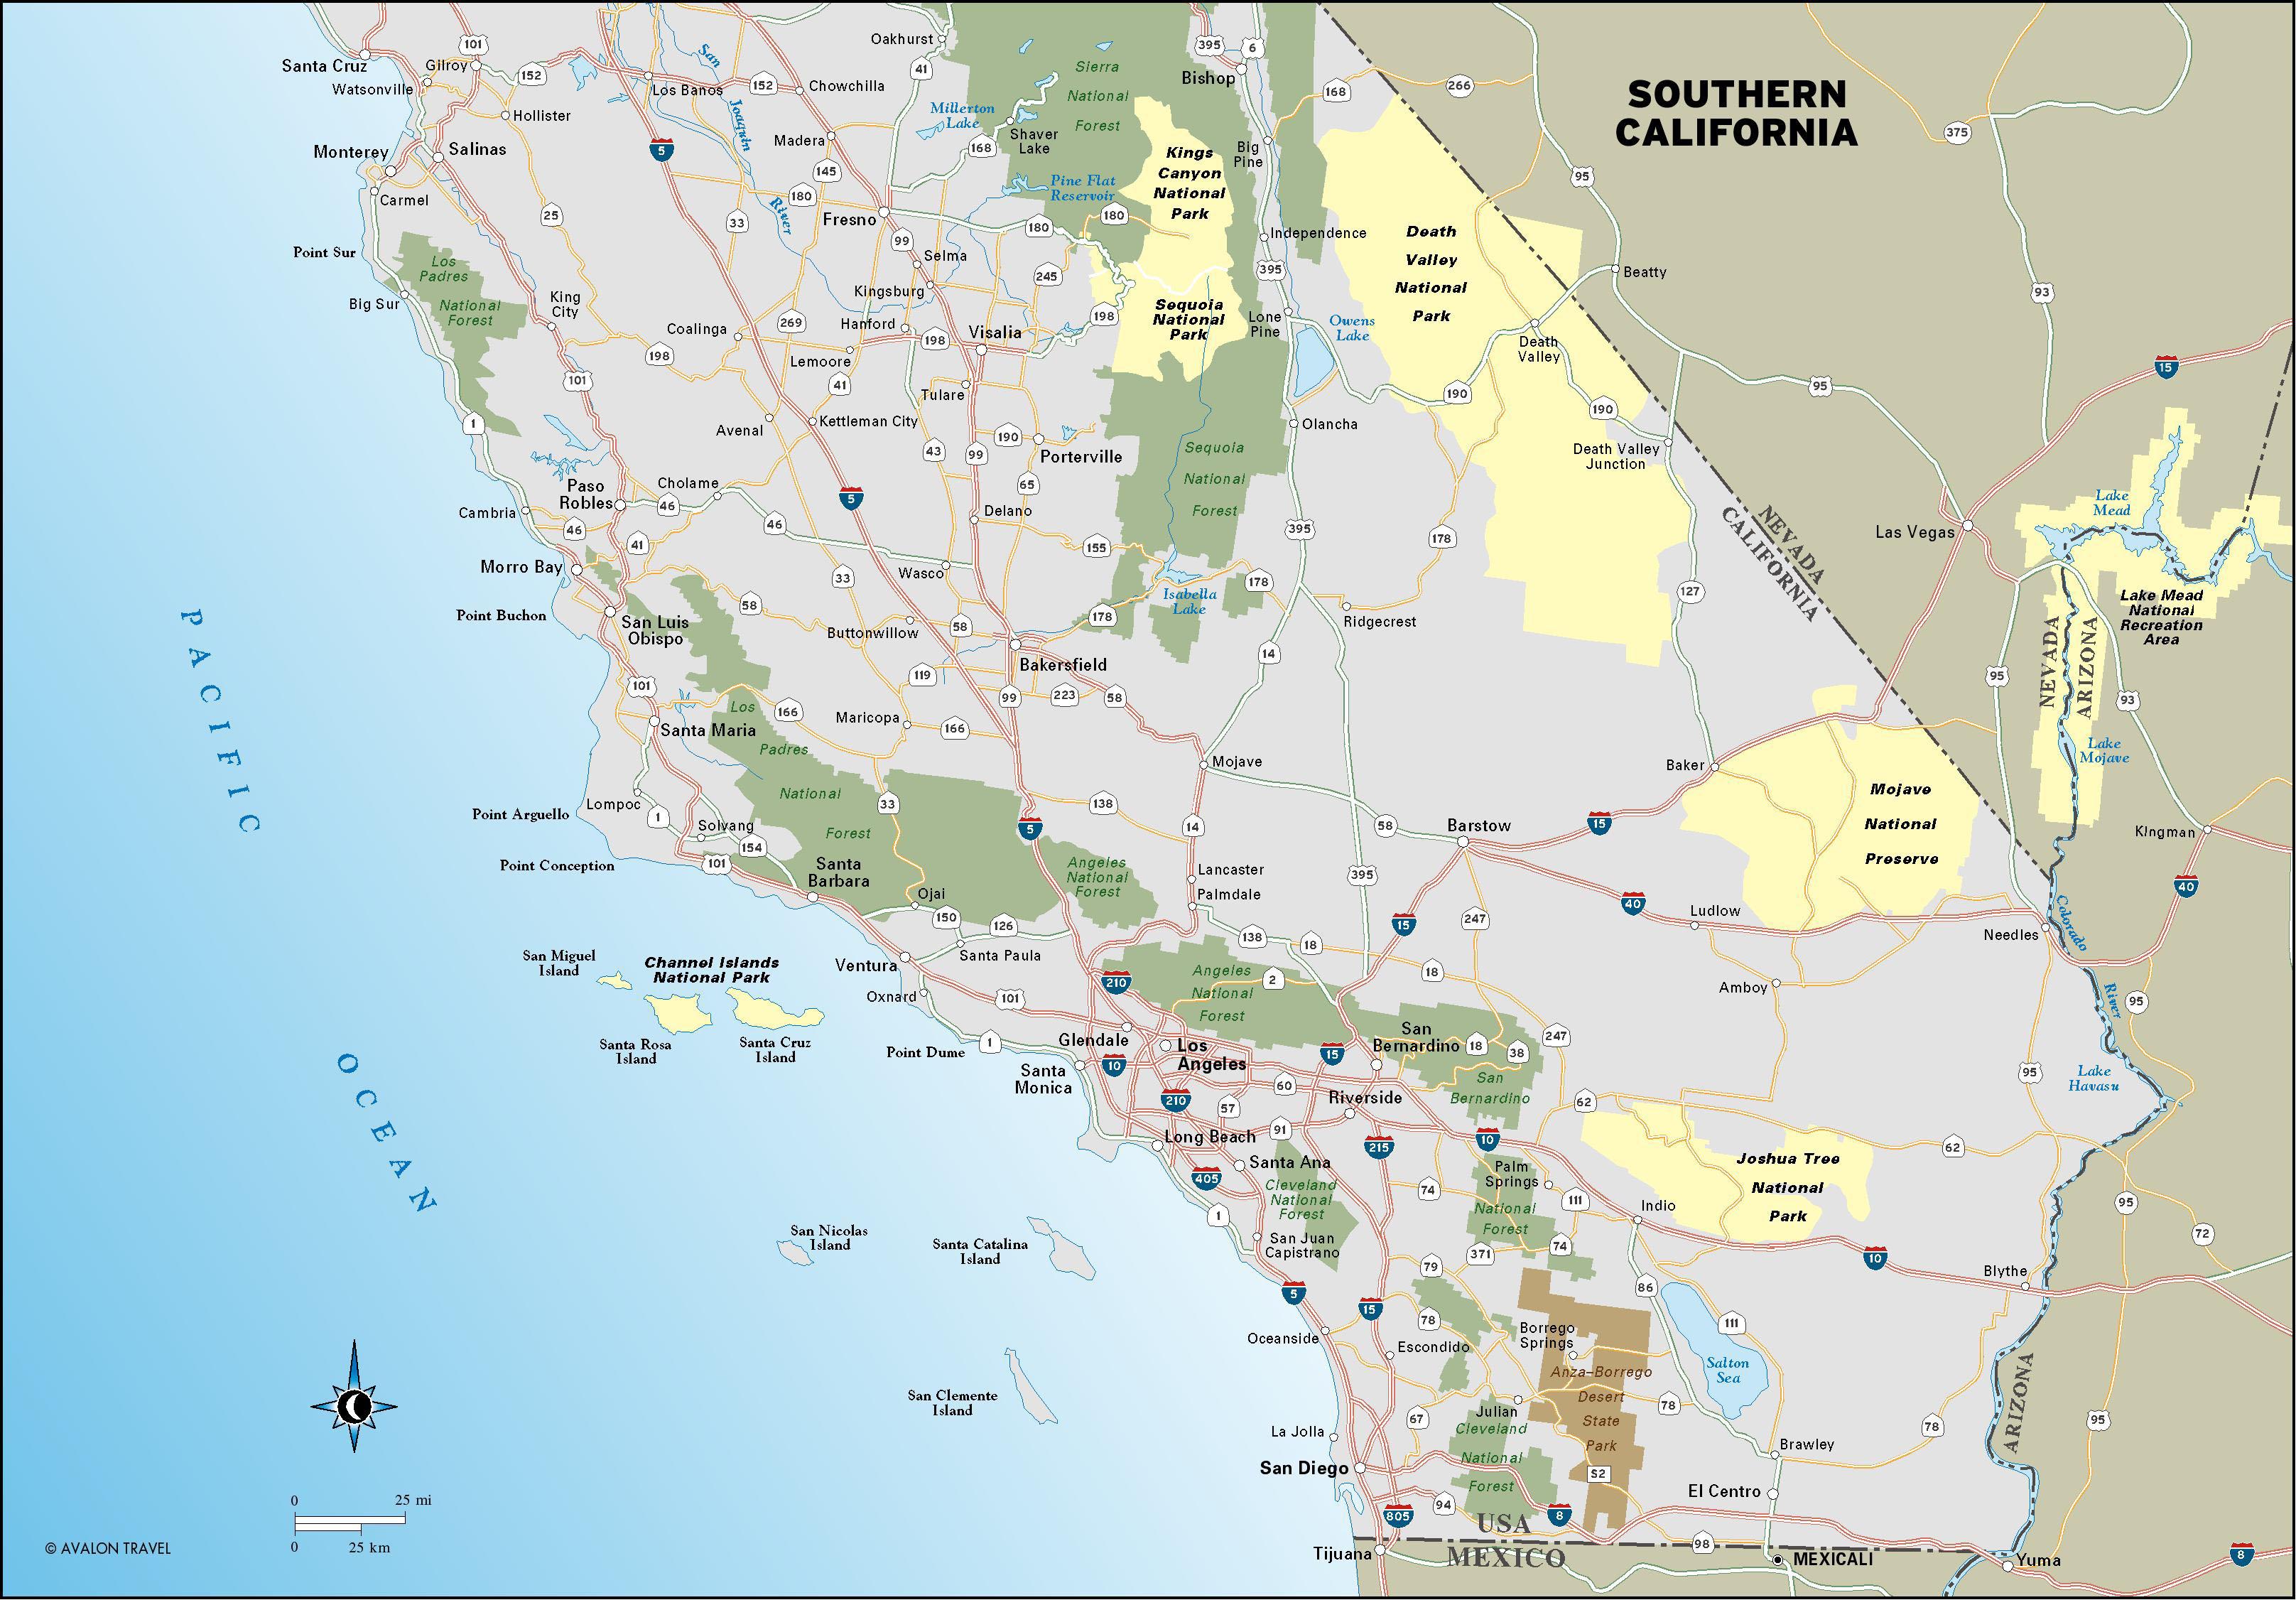 Map Of Central California Coast - Klipy - Map Of Central California Coast Towns